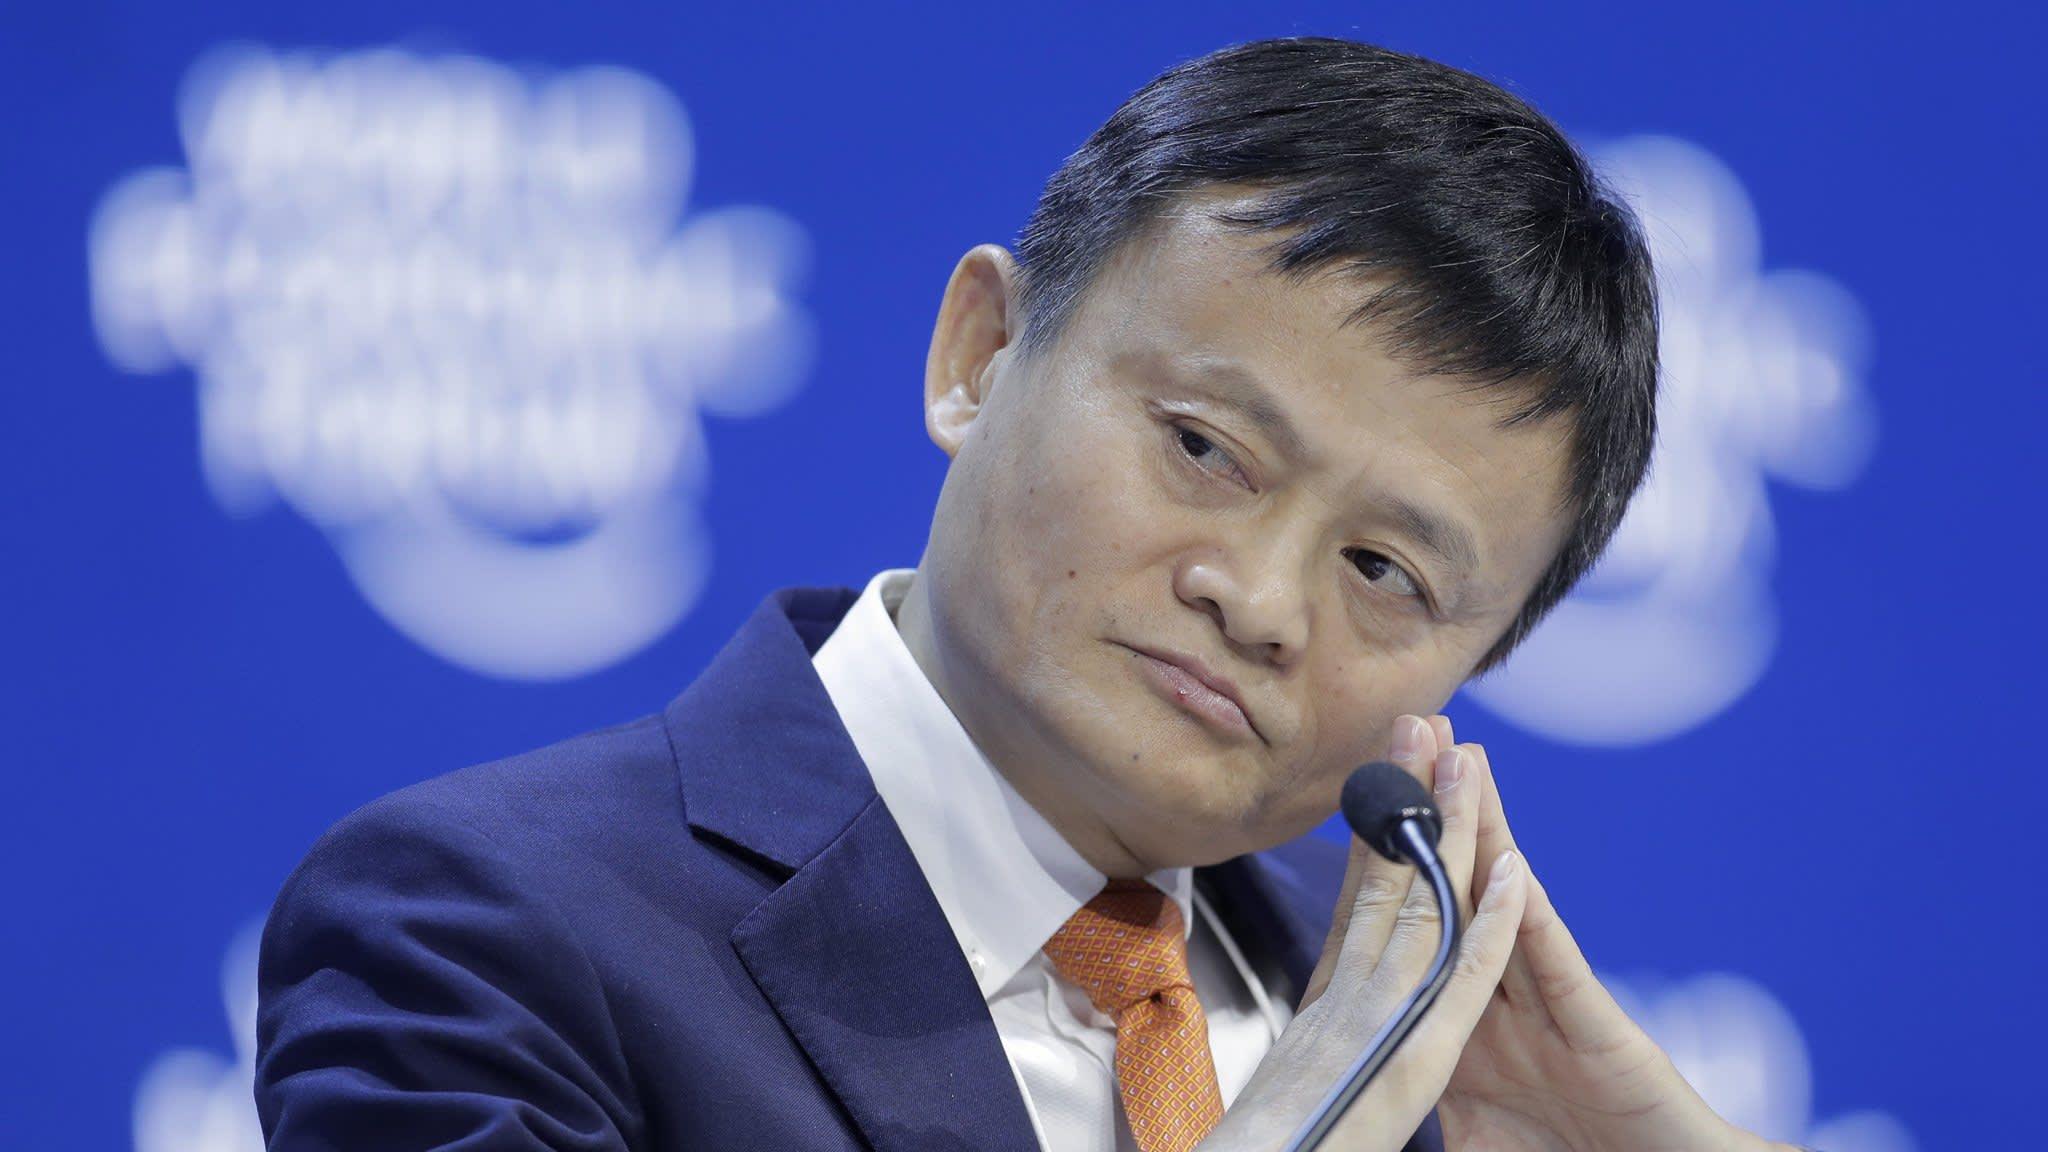 Jack Ma regains title as China's richest man